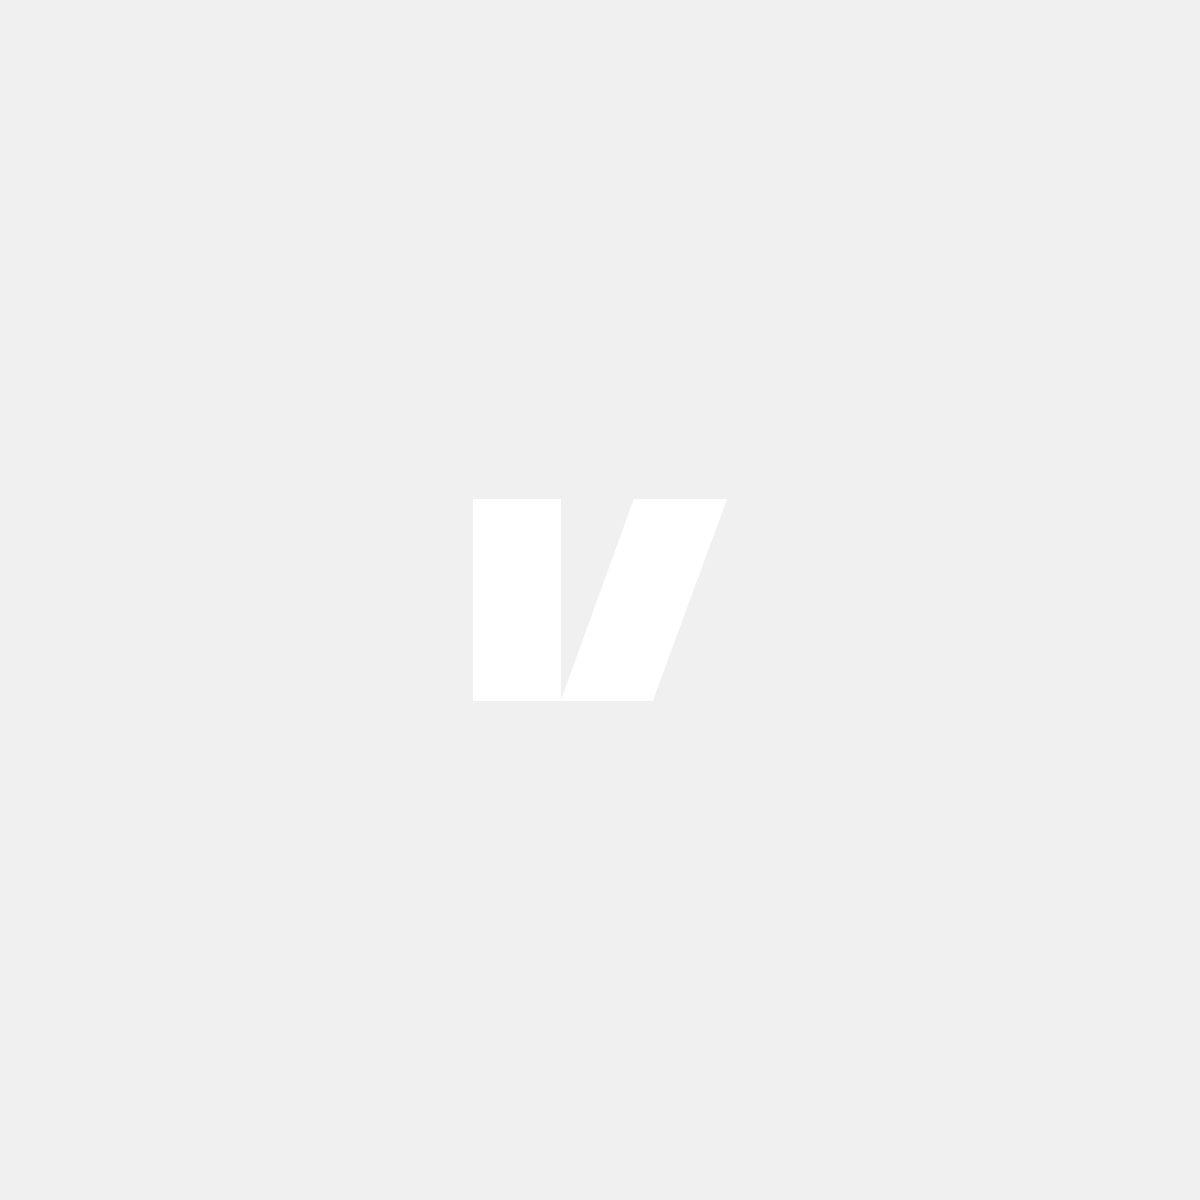 Hasplåt bak till Volvo XC70, 08-16, dubbla utblås